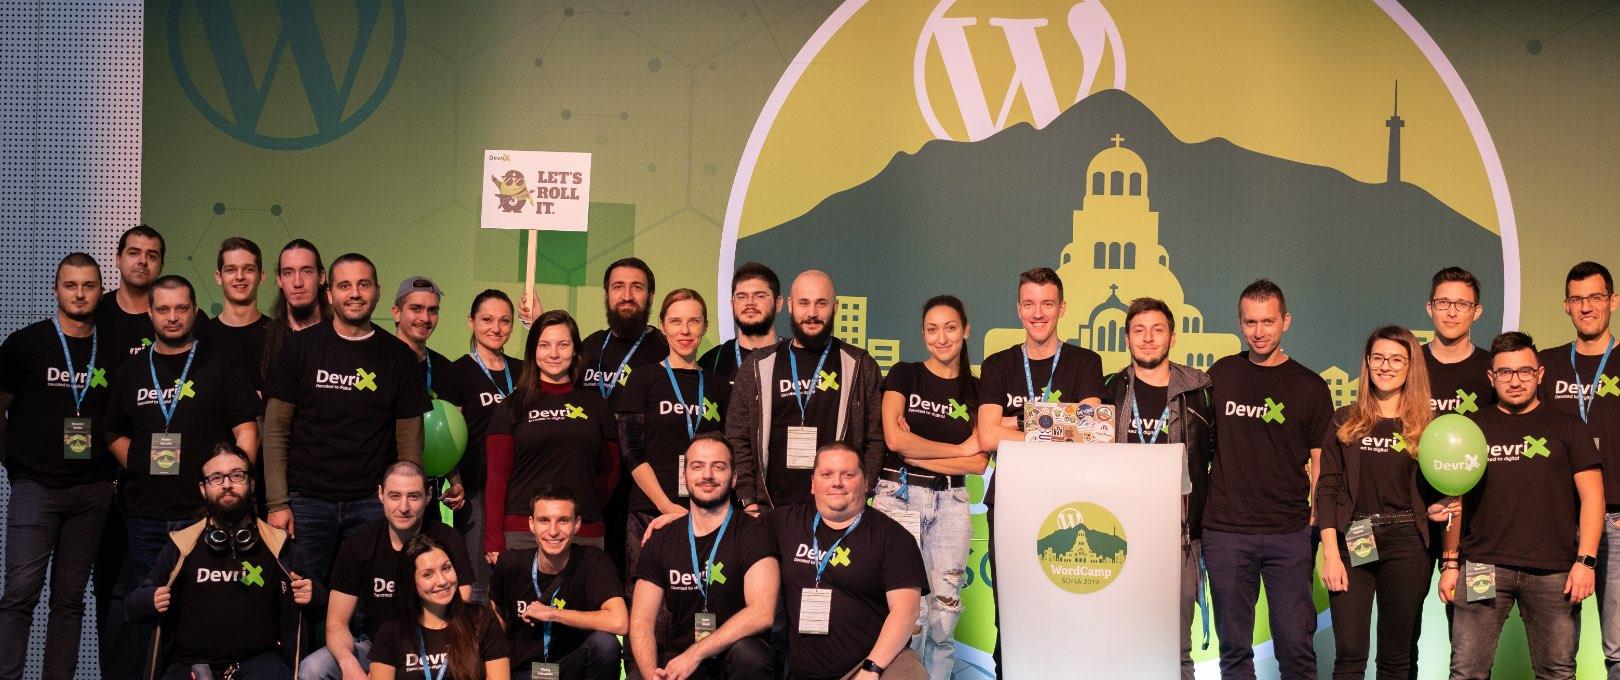 DevriX team at WCSOF 2019